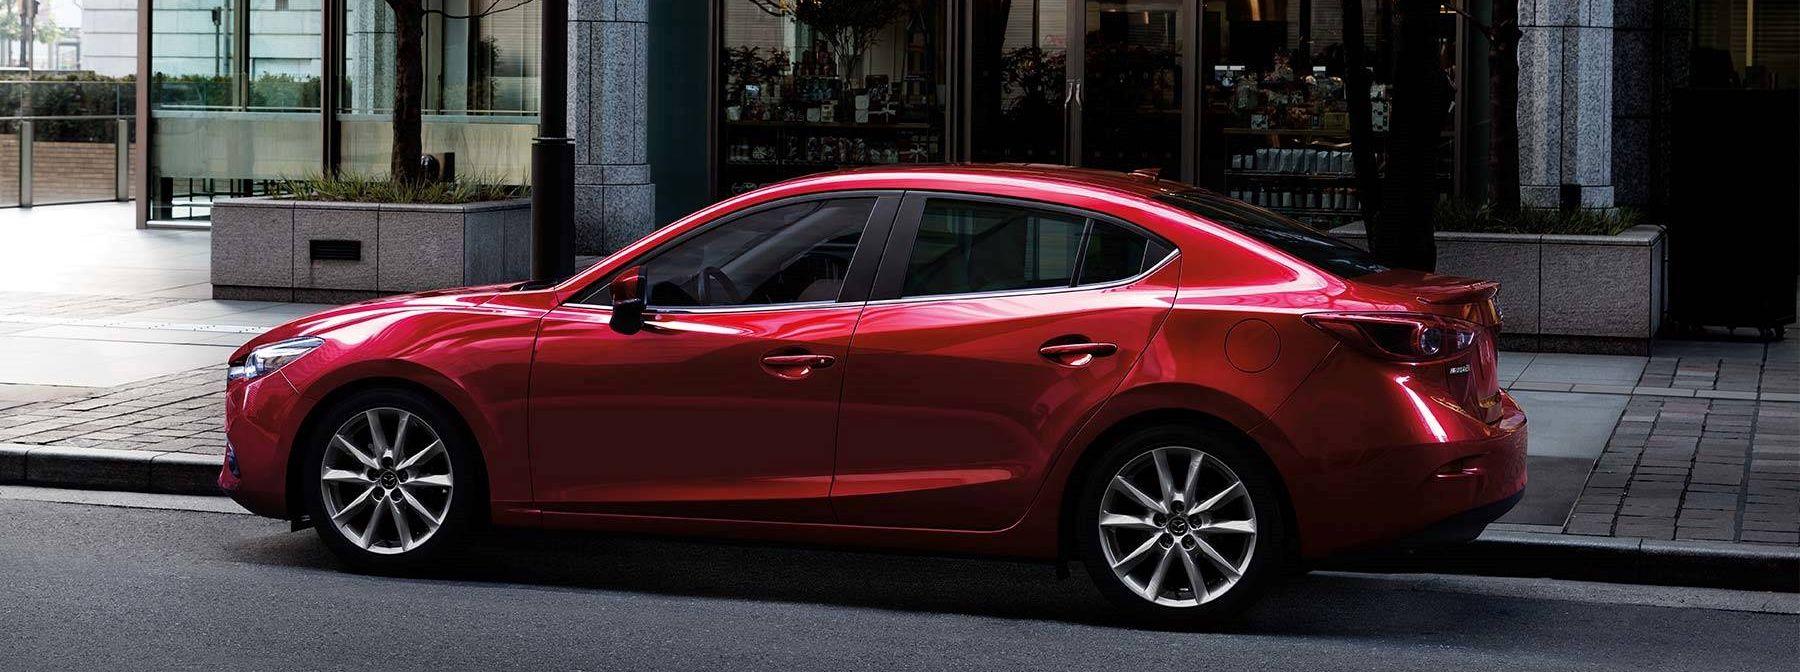 2018 Mazda3 Financing near Phoenix, AZ